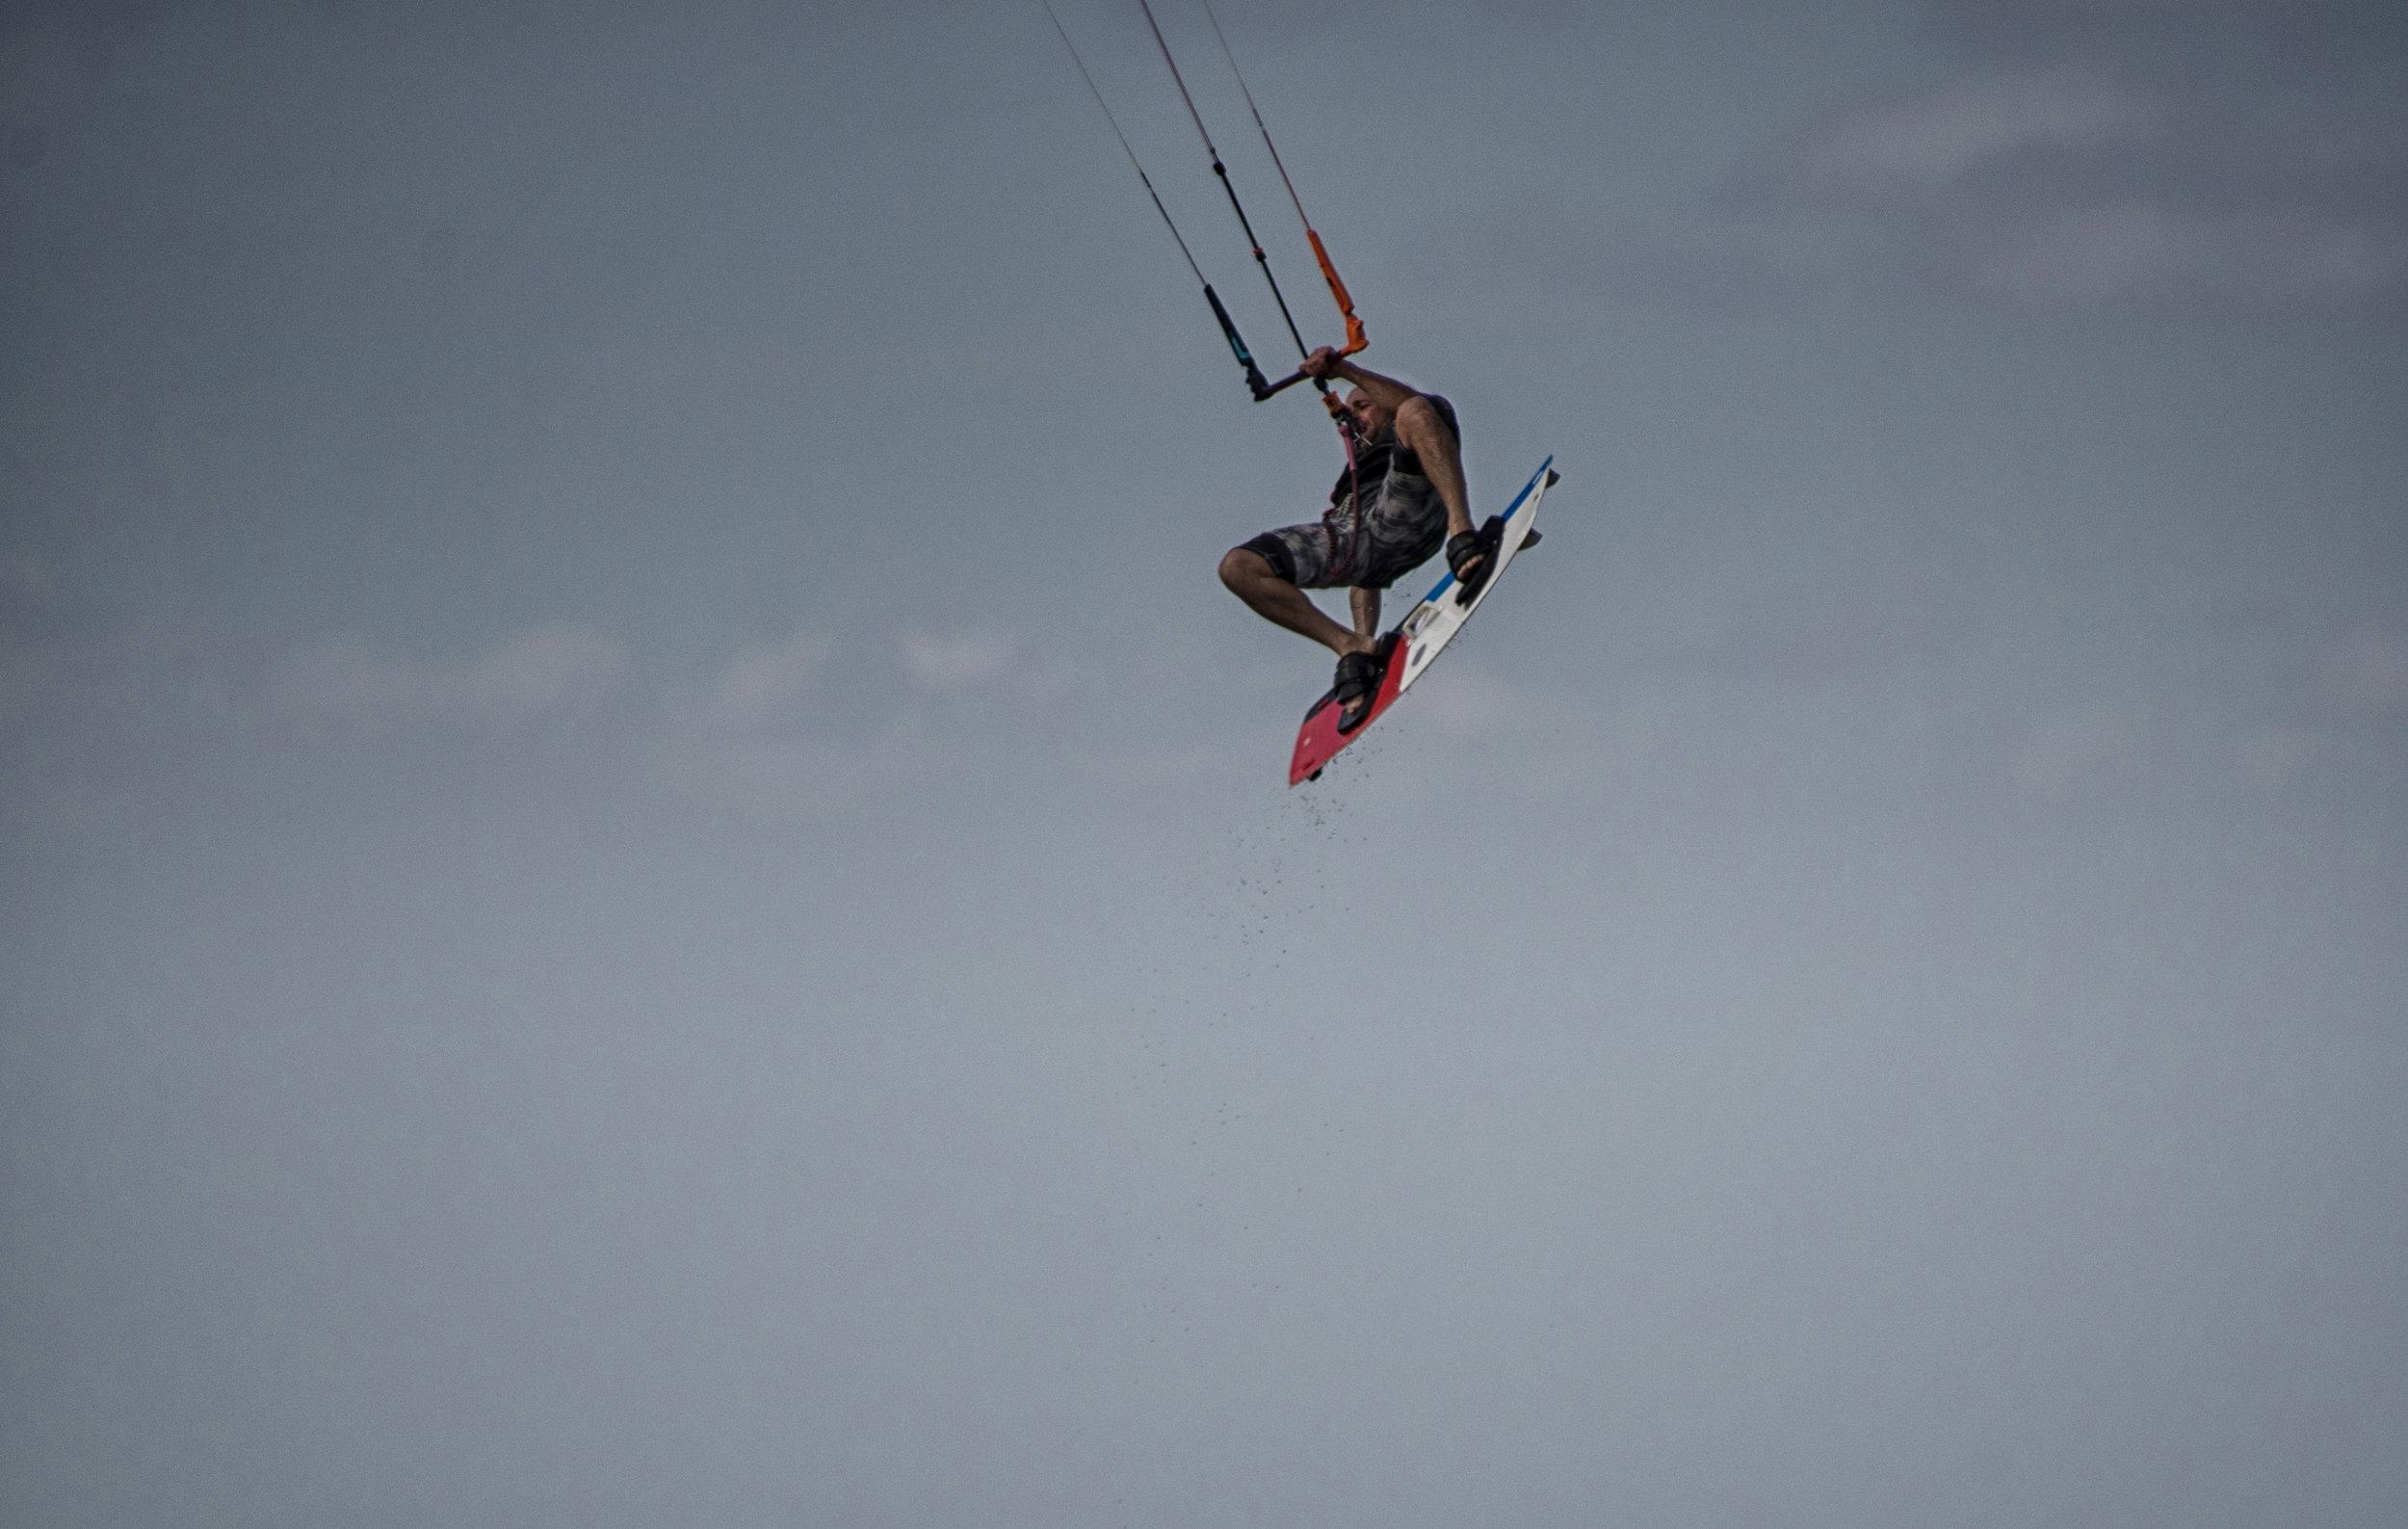 kiteboarder, OBX